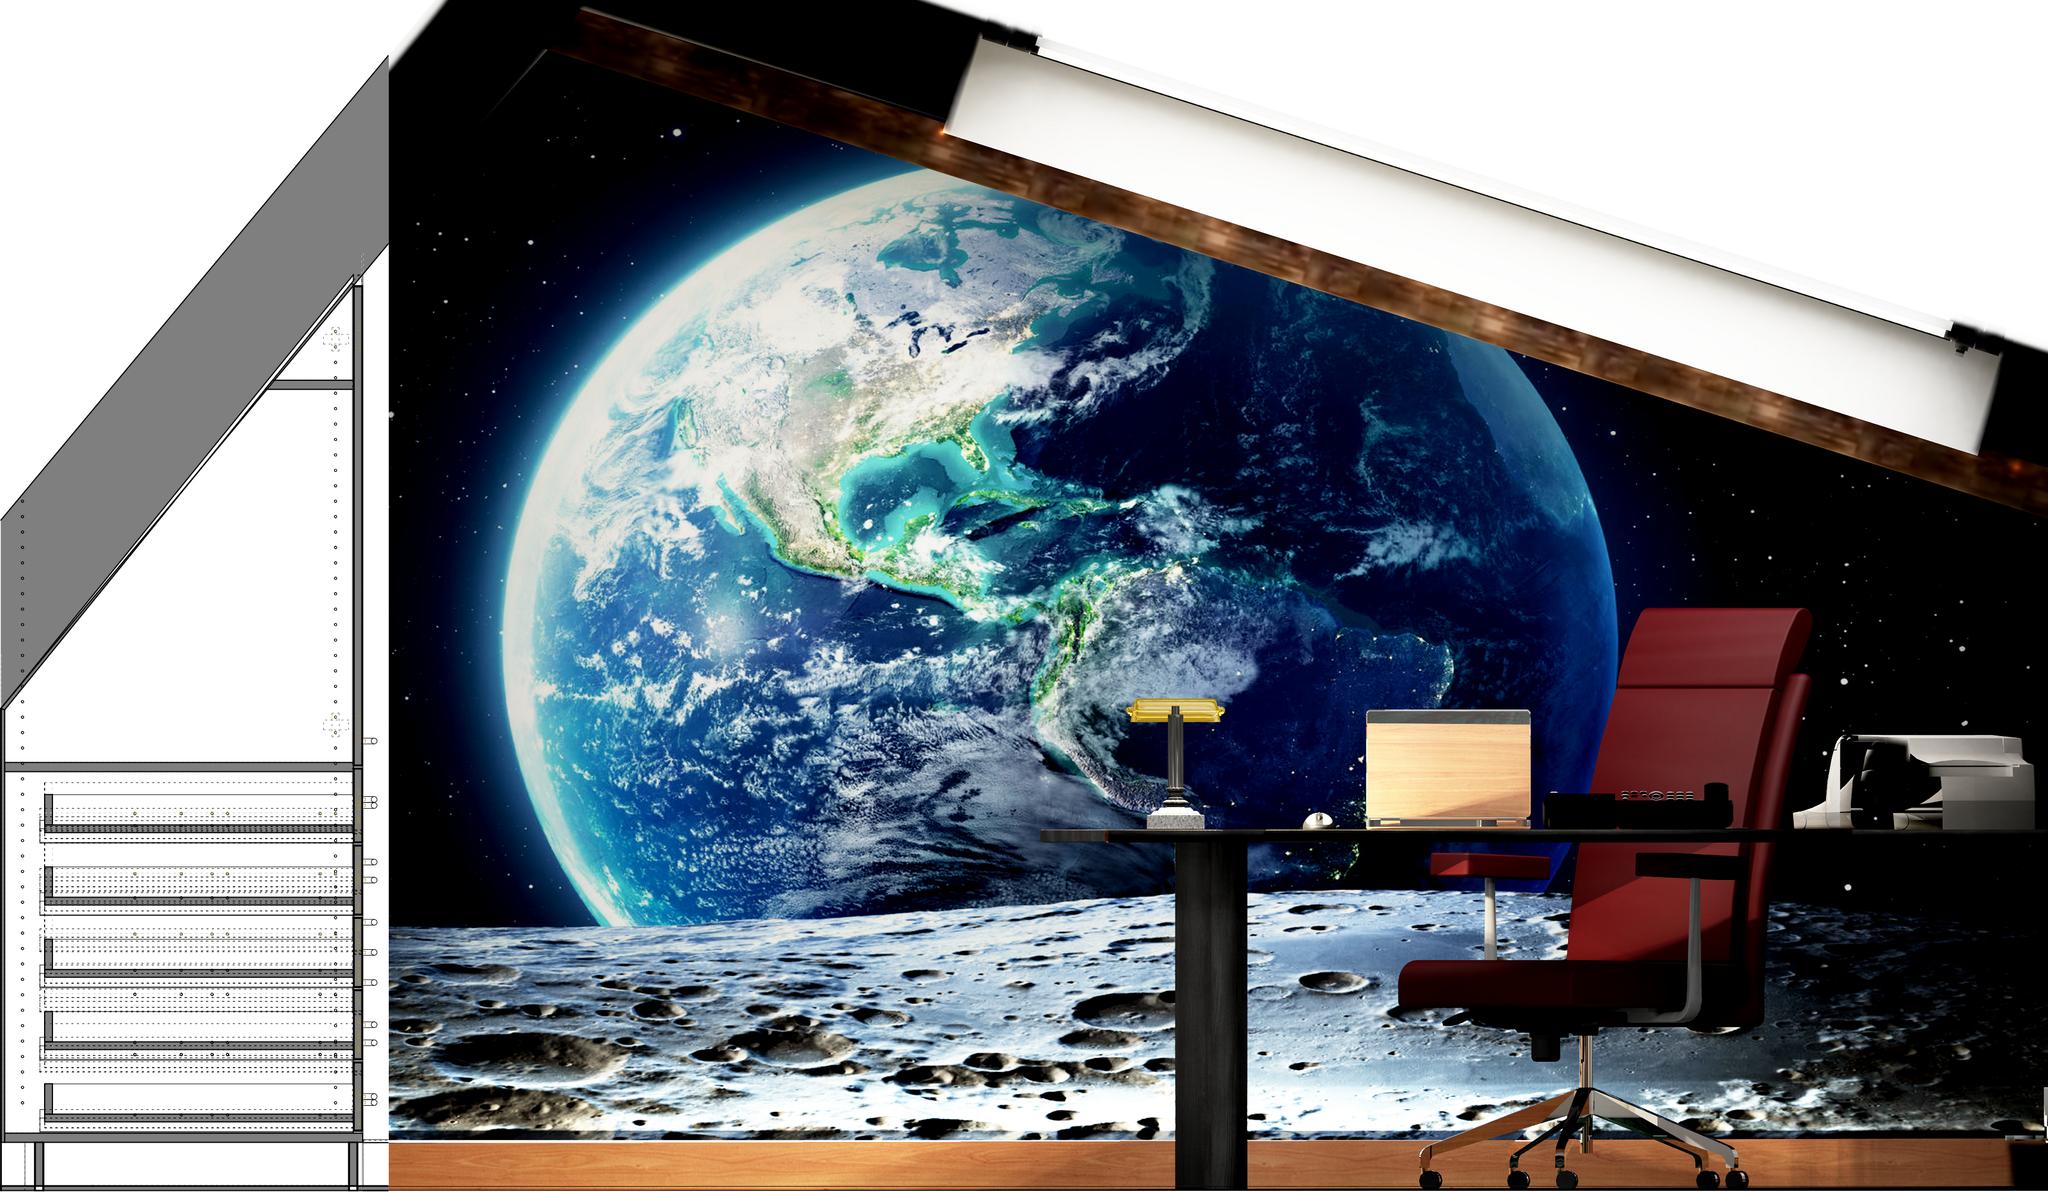 Büro Front Fotorealistik mit Blick auf Terra